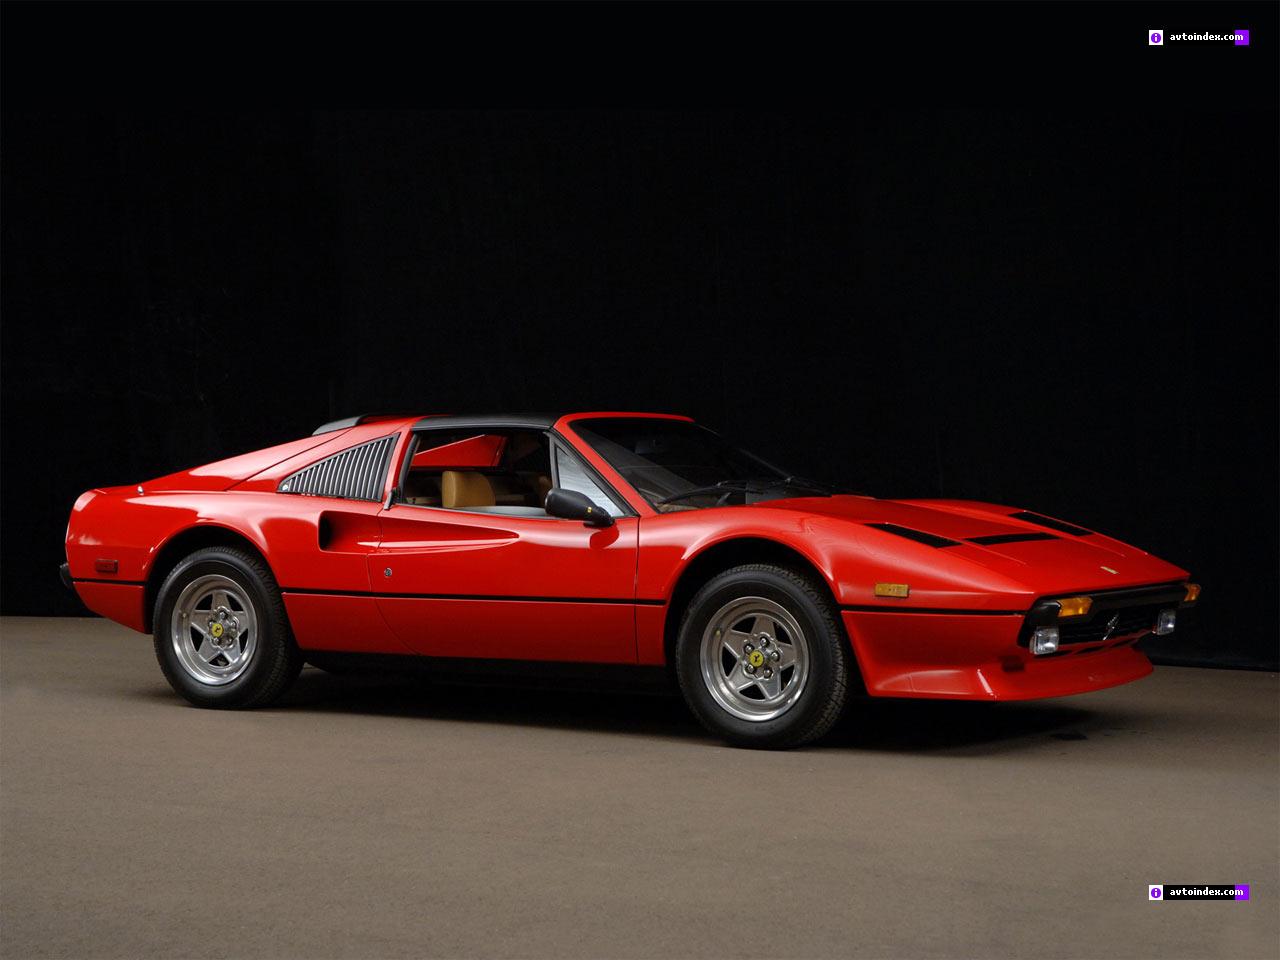 http://4.bp.blogspot.com/-e0Vrc5LcH4U/UYDYVJwNS7I/AAAAAAAAbNA/X4K3smHIPC4/s1600/Ferrari_308_GTS_82-85_30.jpg